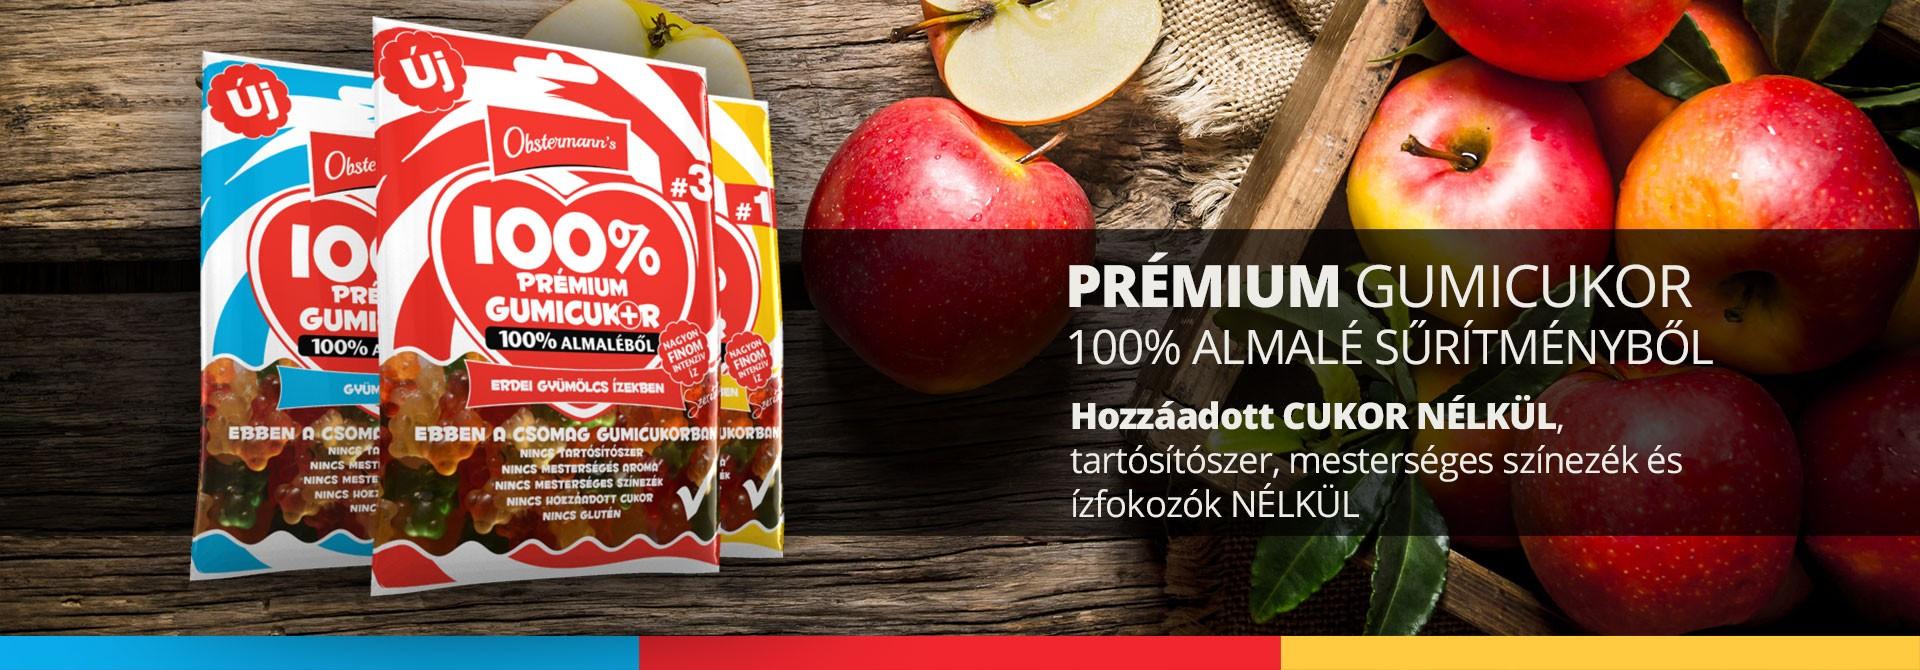 prémium gumicukor 100% almaléből